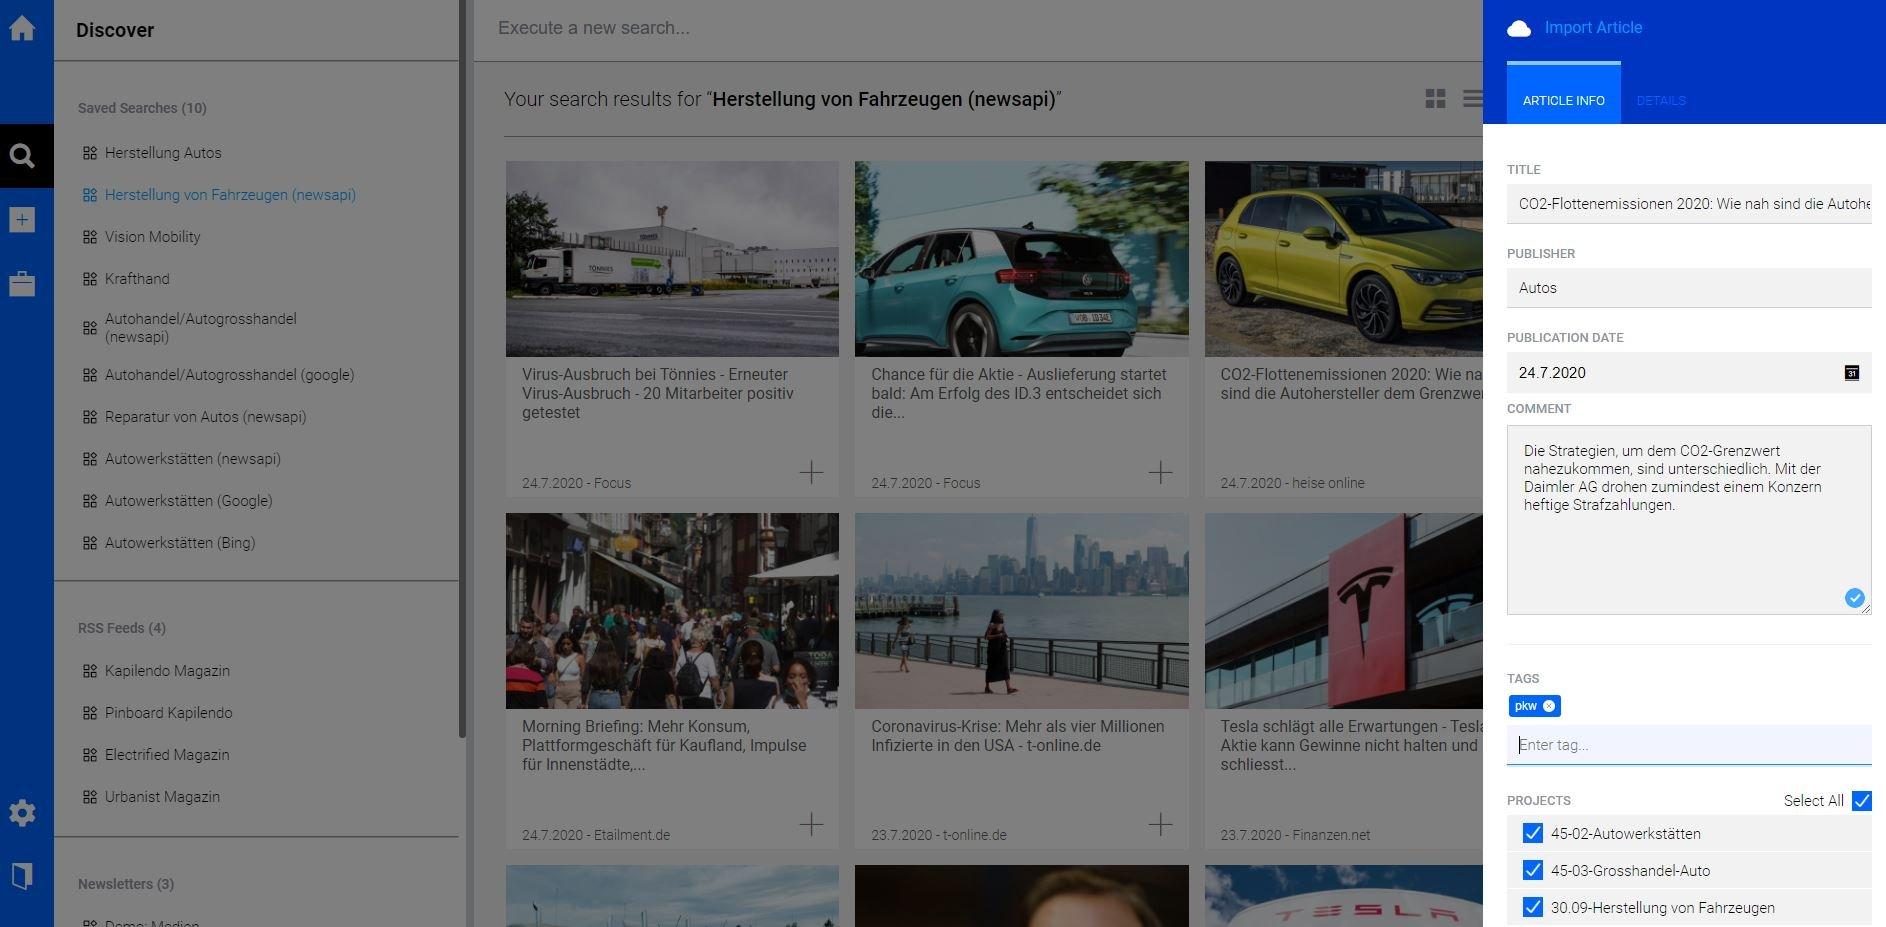 scope tool kuratierte inhalte content curation